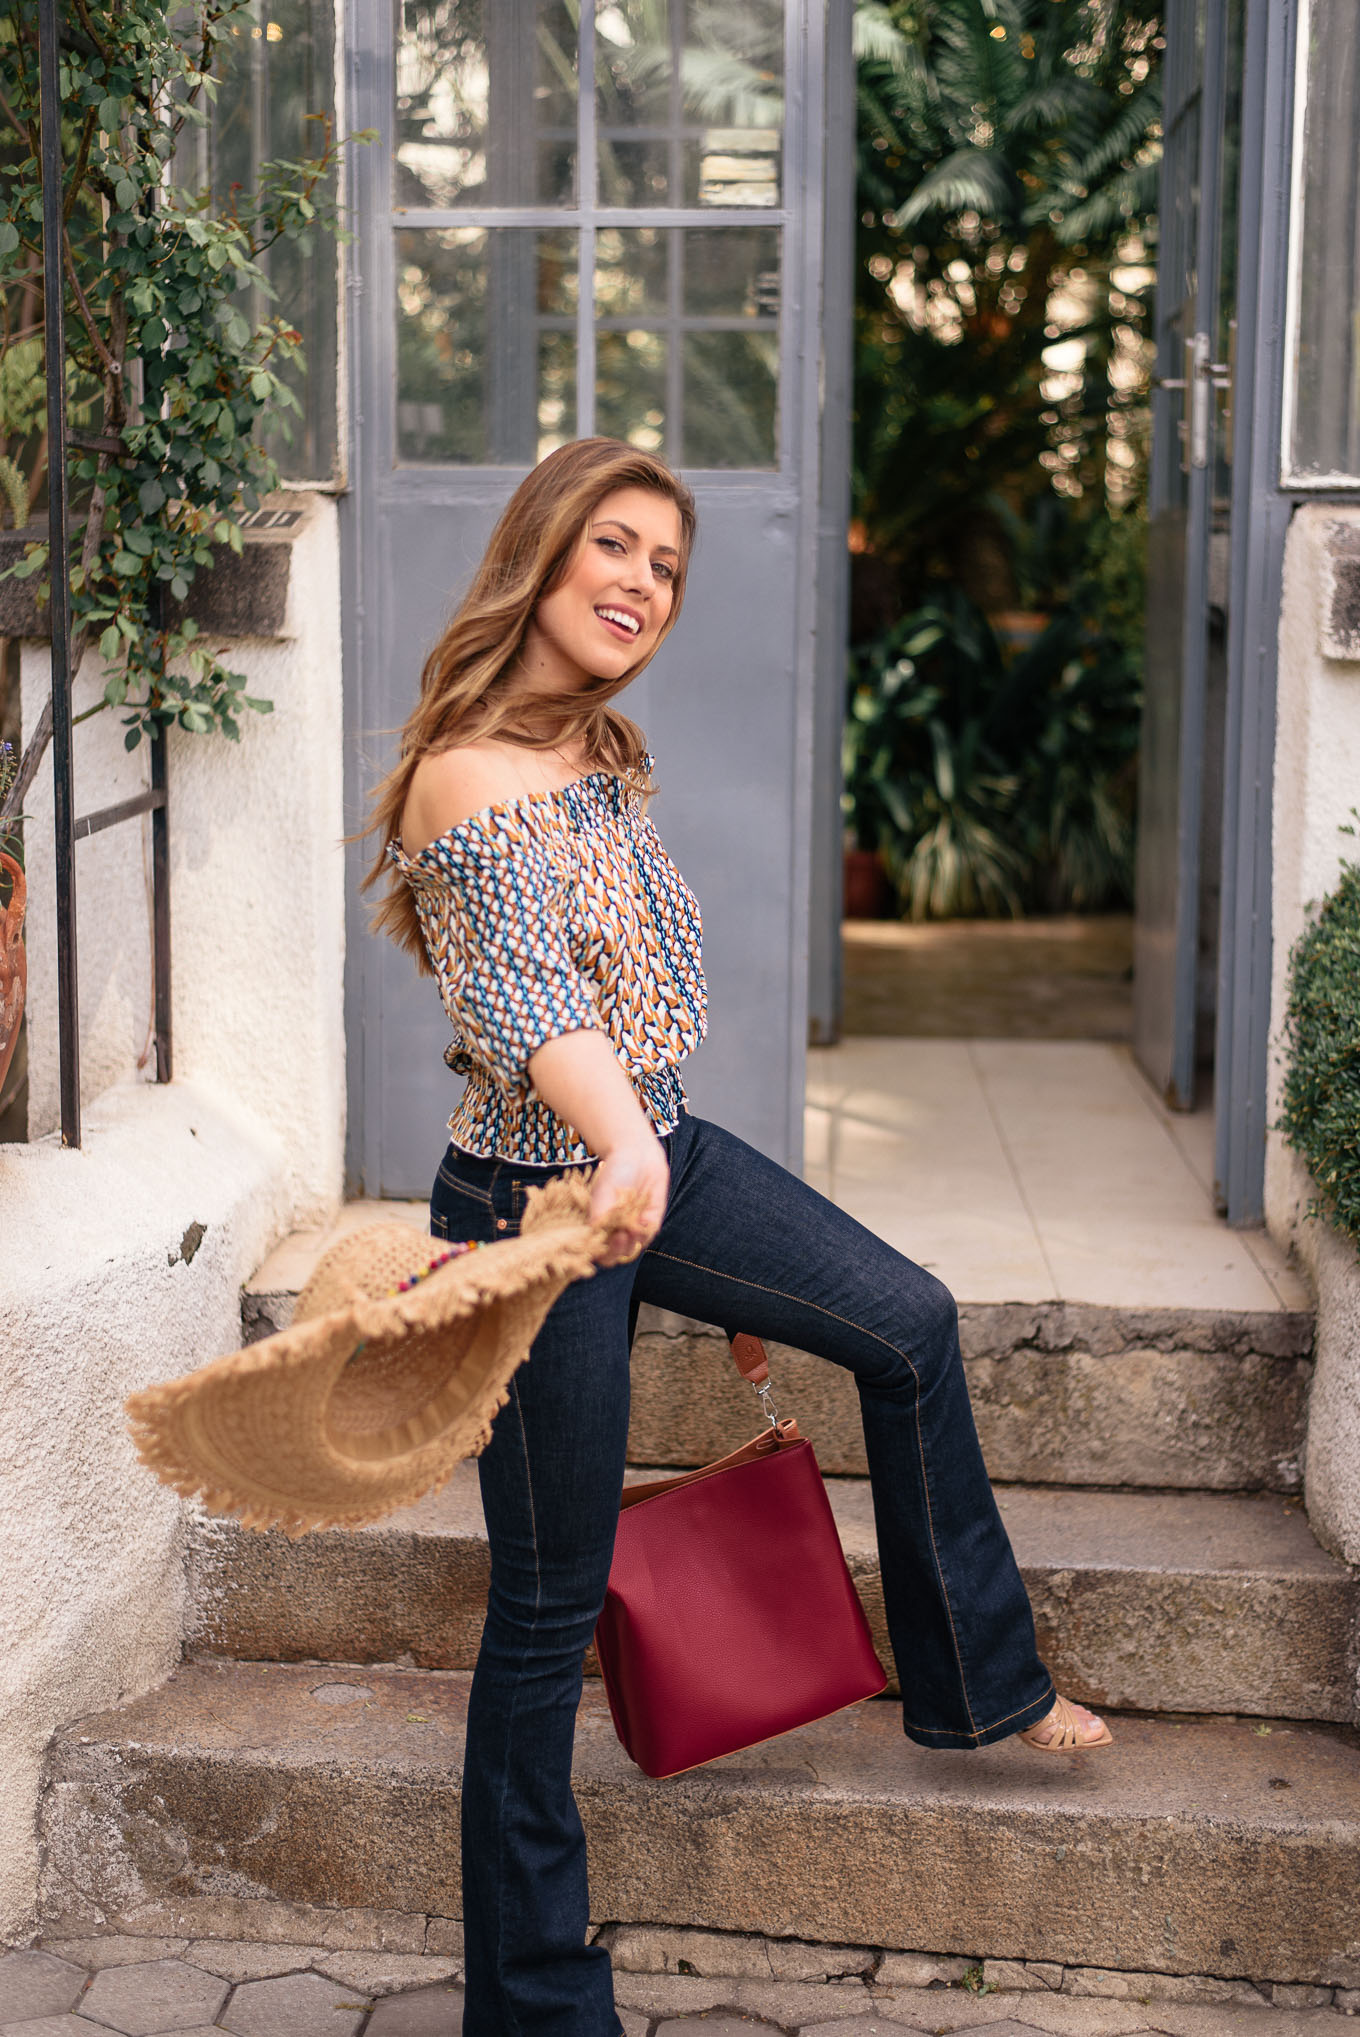 European style blogger